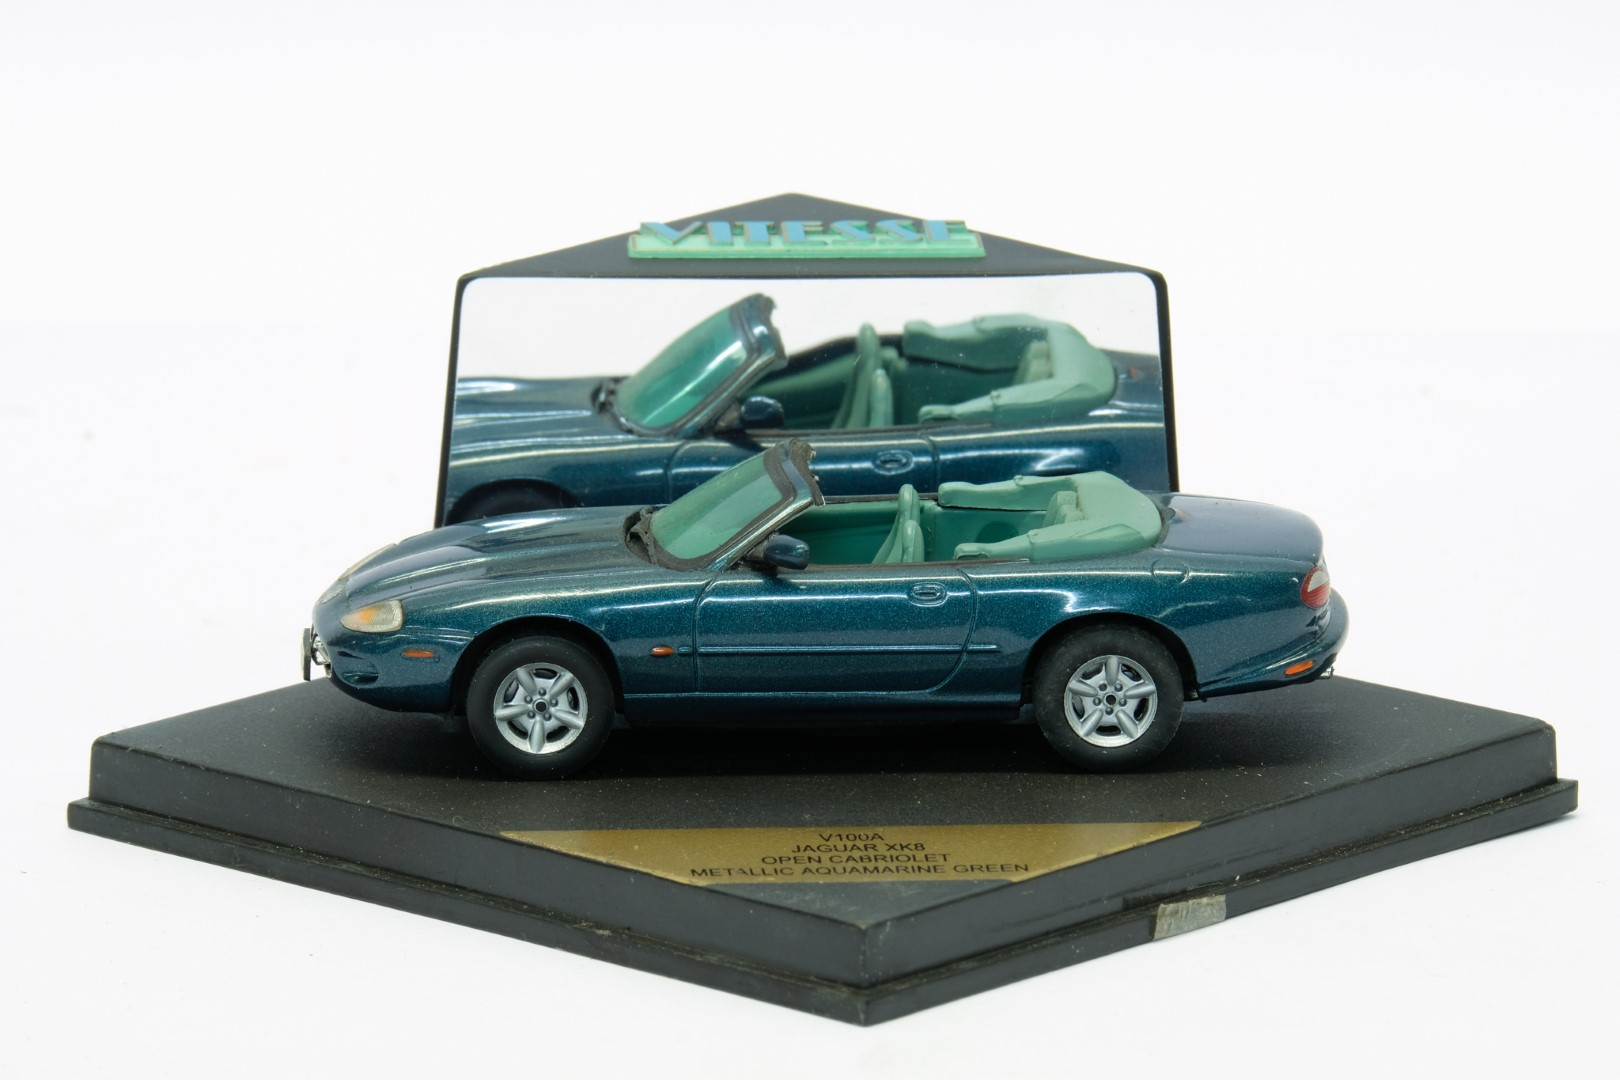 Vitesse 2 Jaguar XK8 Models - Image 2 of 3